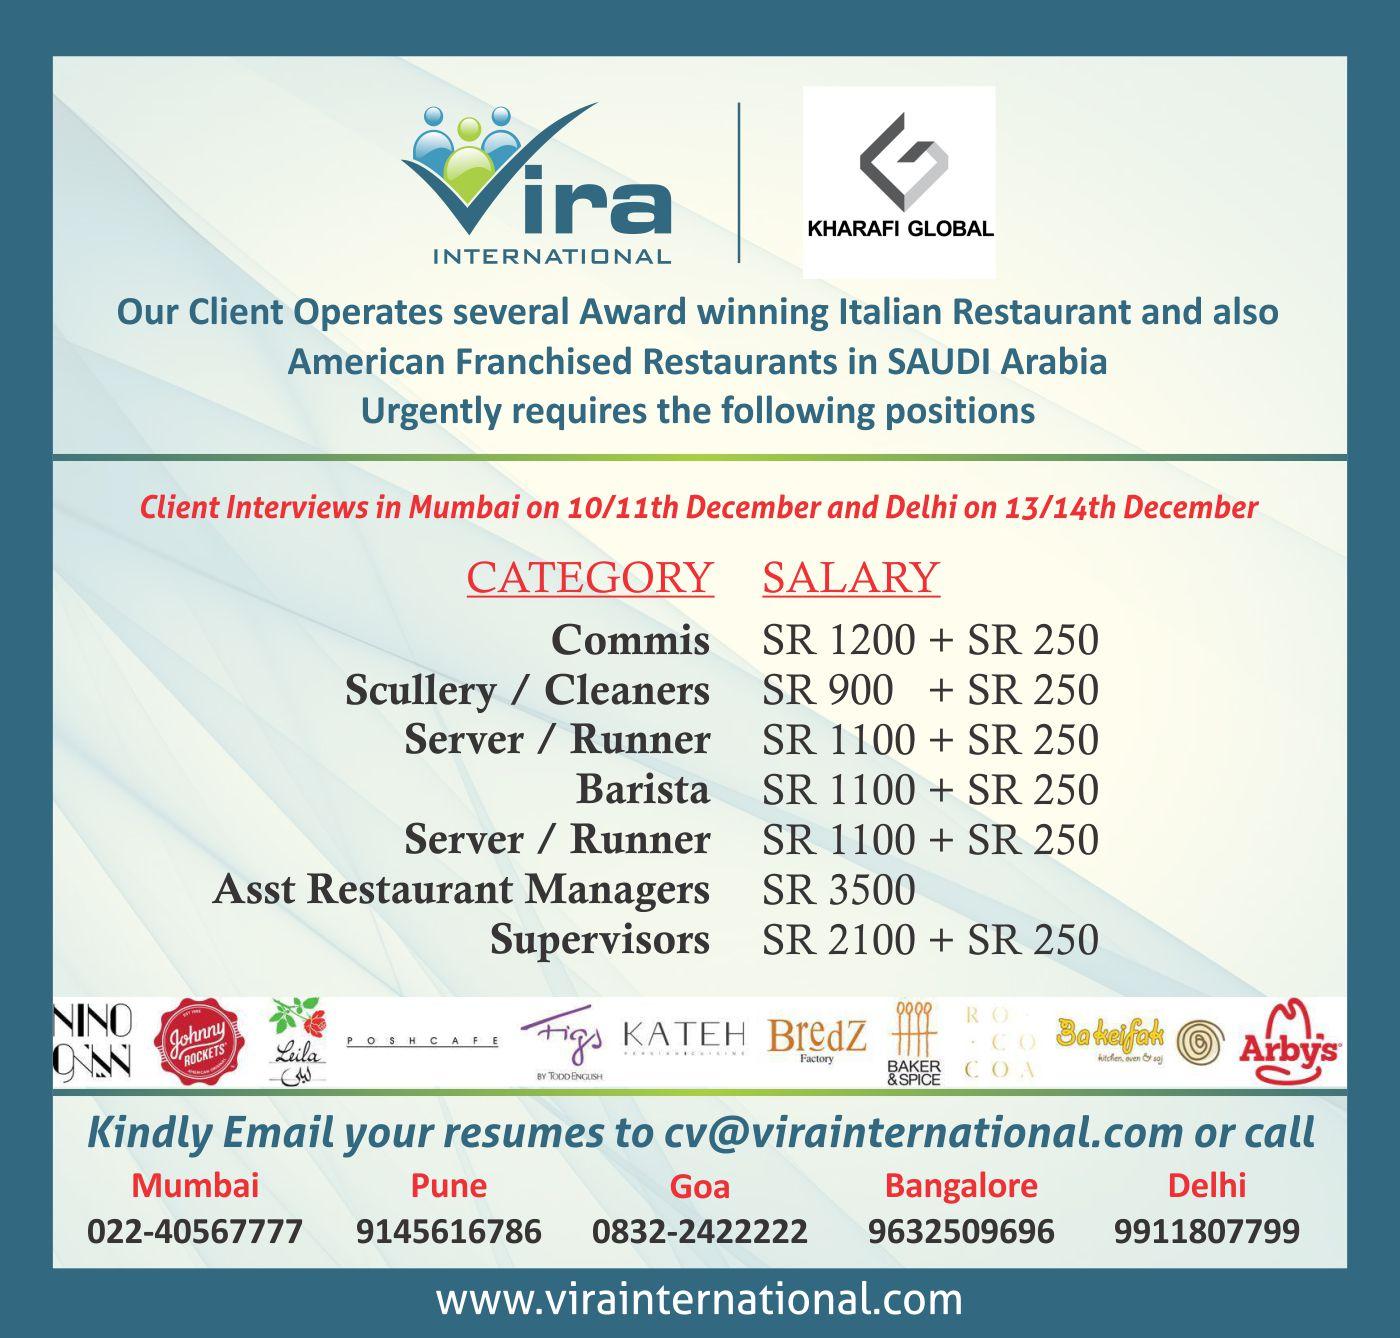 Vira International on Twitter: